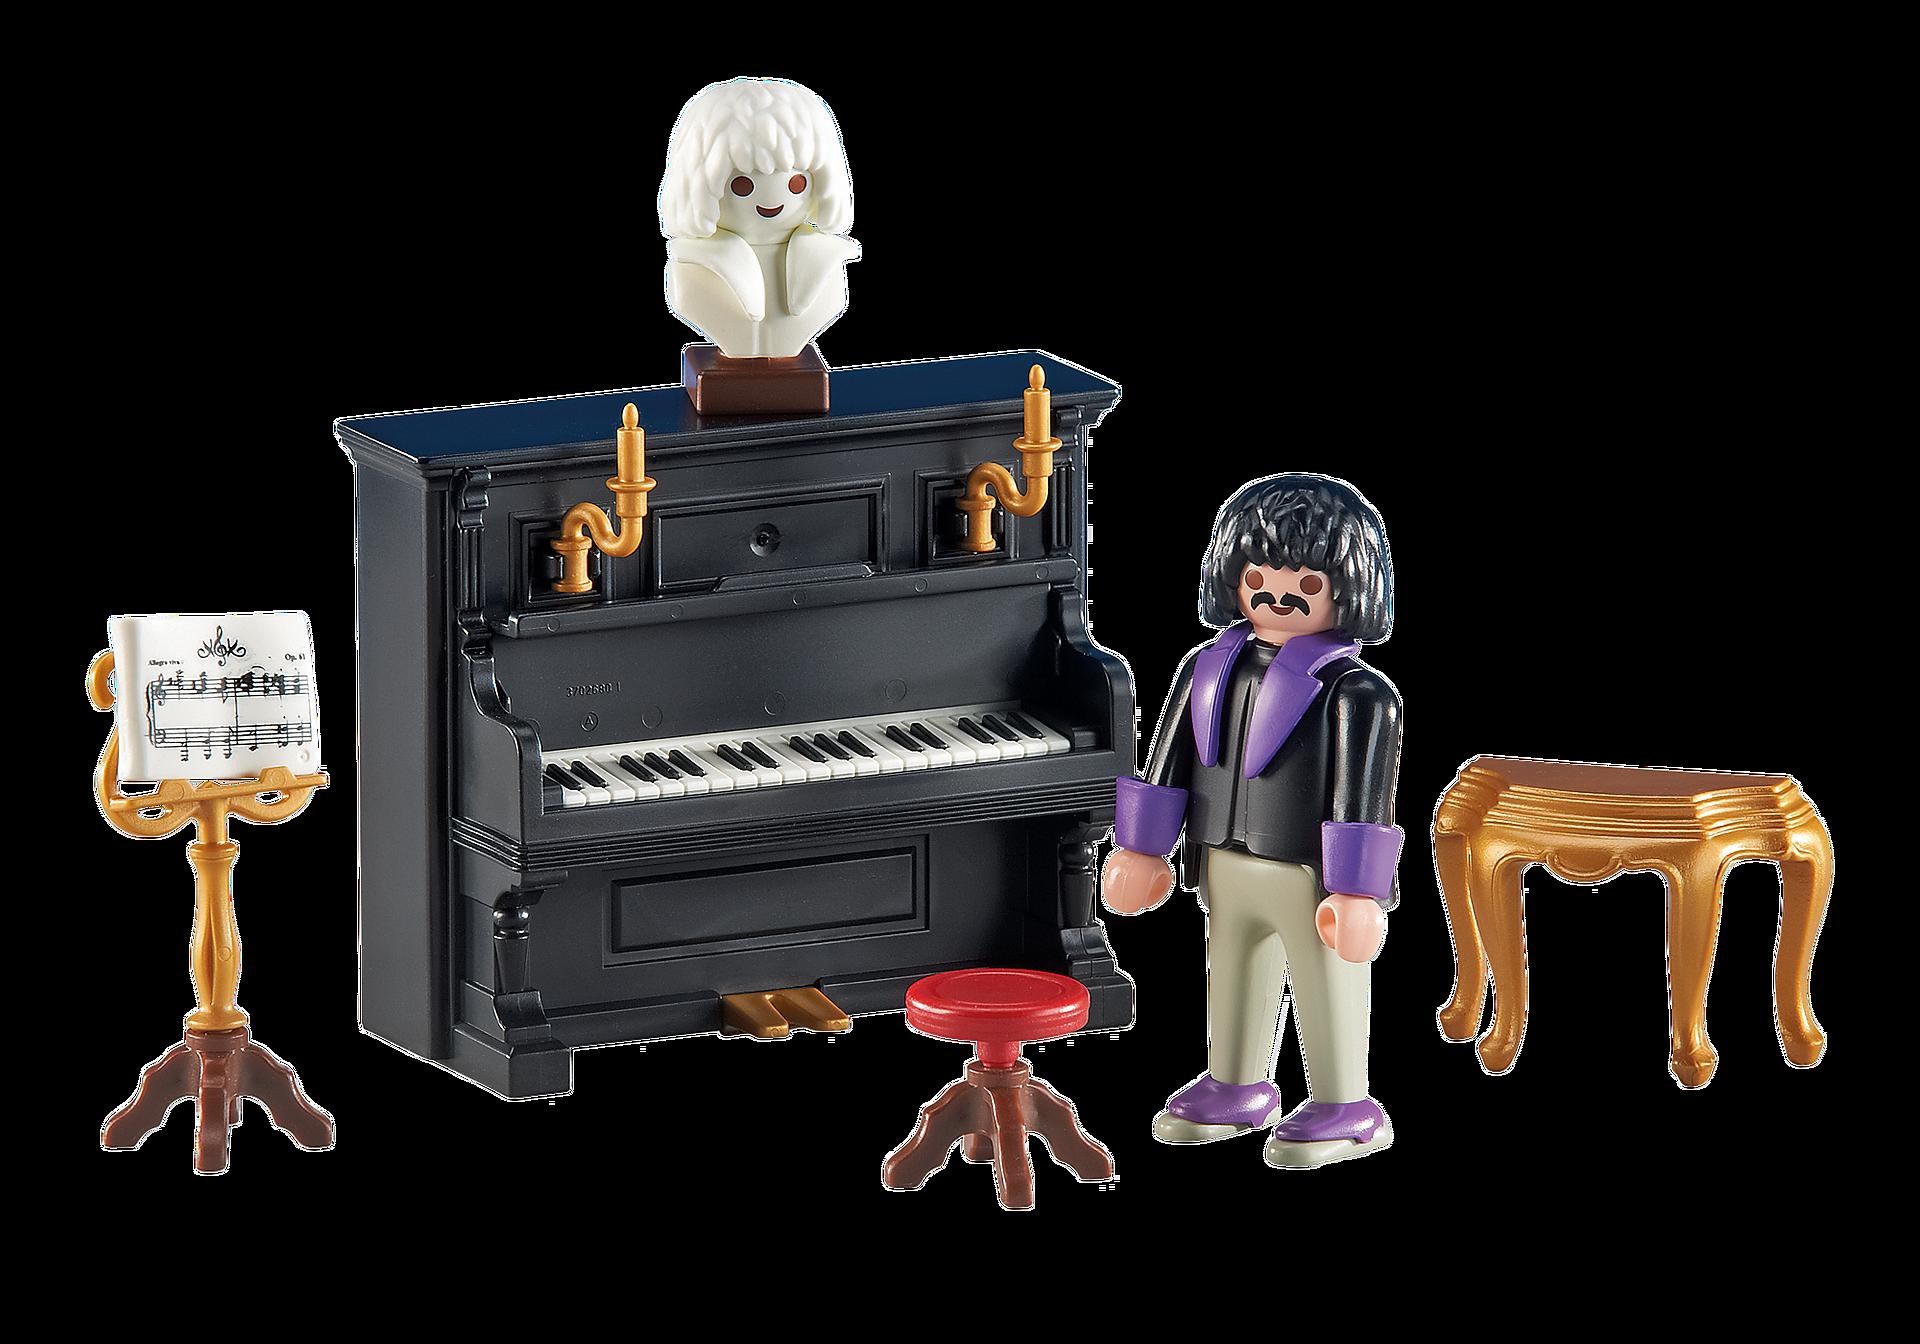 6527 Pianist mit Klavier zoom image1